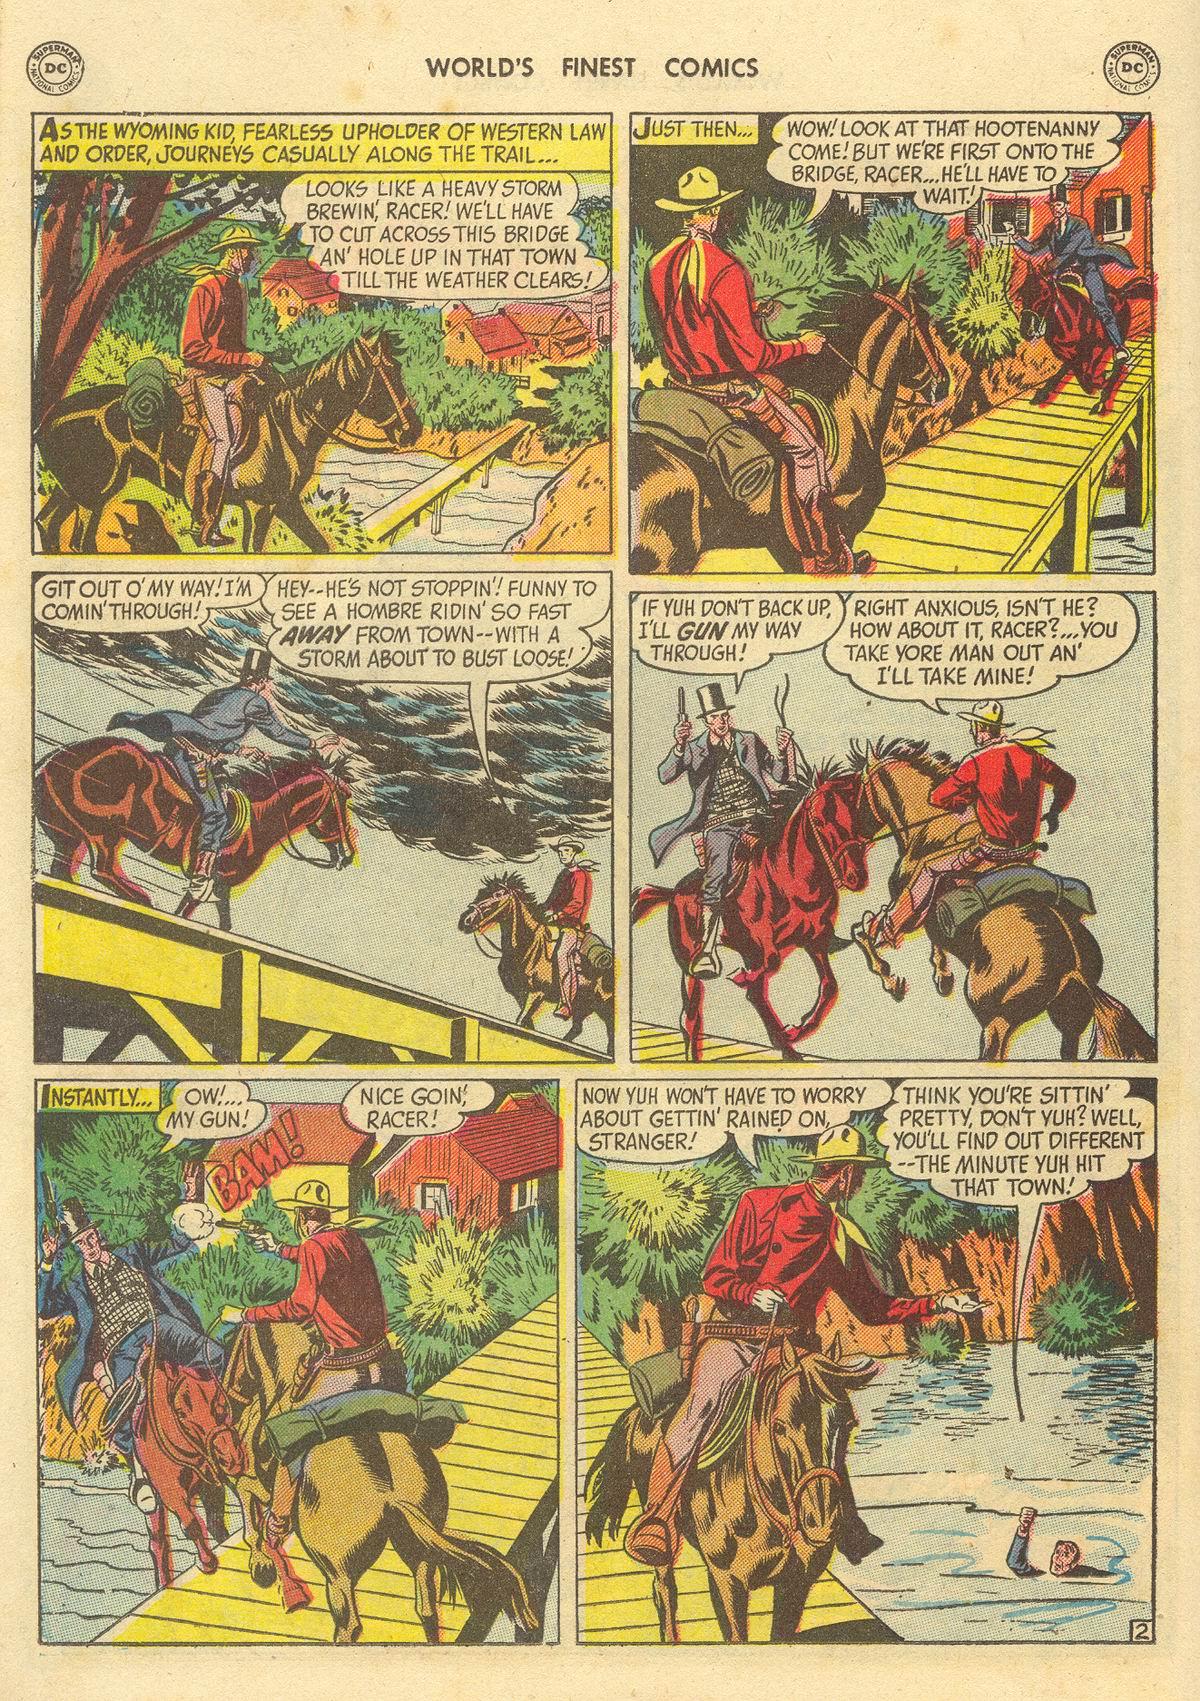 Read online World's Finest Comics comic -  Issue #51 - 44